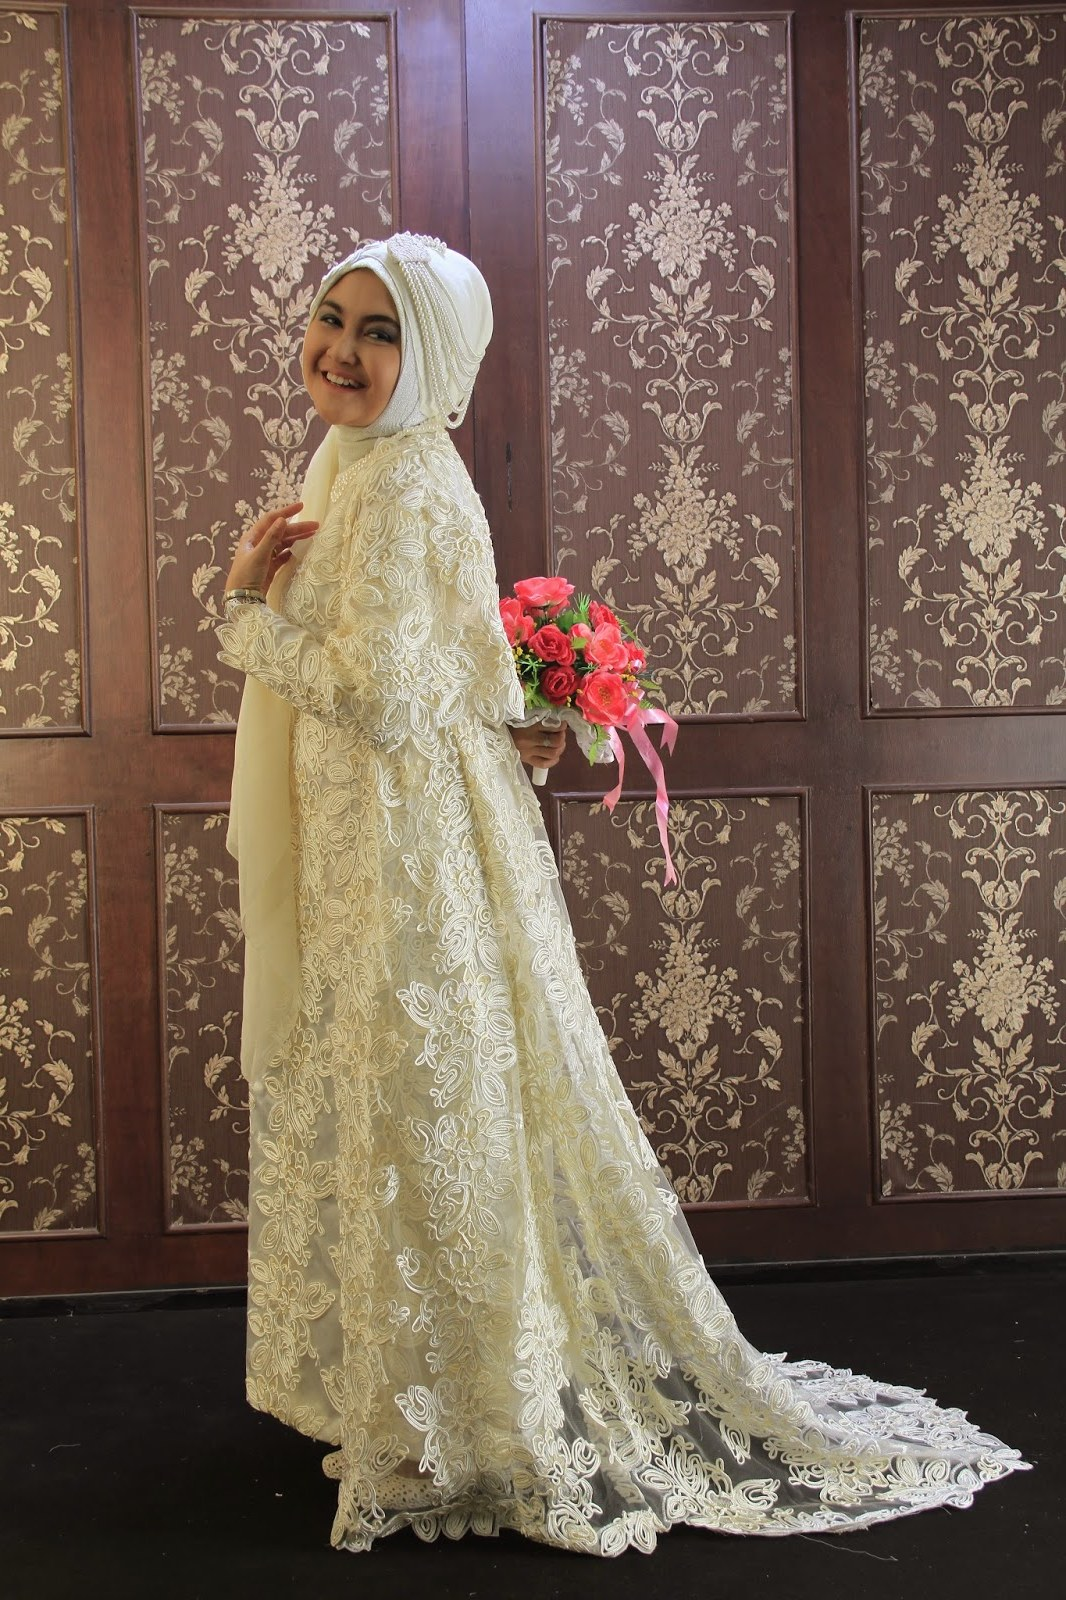 Ide Baju Pengantin Muslimah Qwdq Padme Wedding Dress Replica – Fashion Dresses